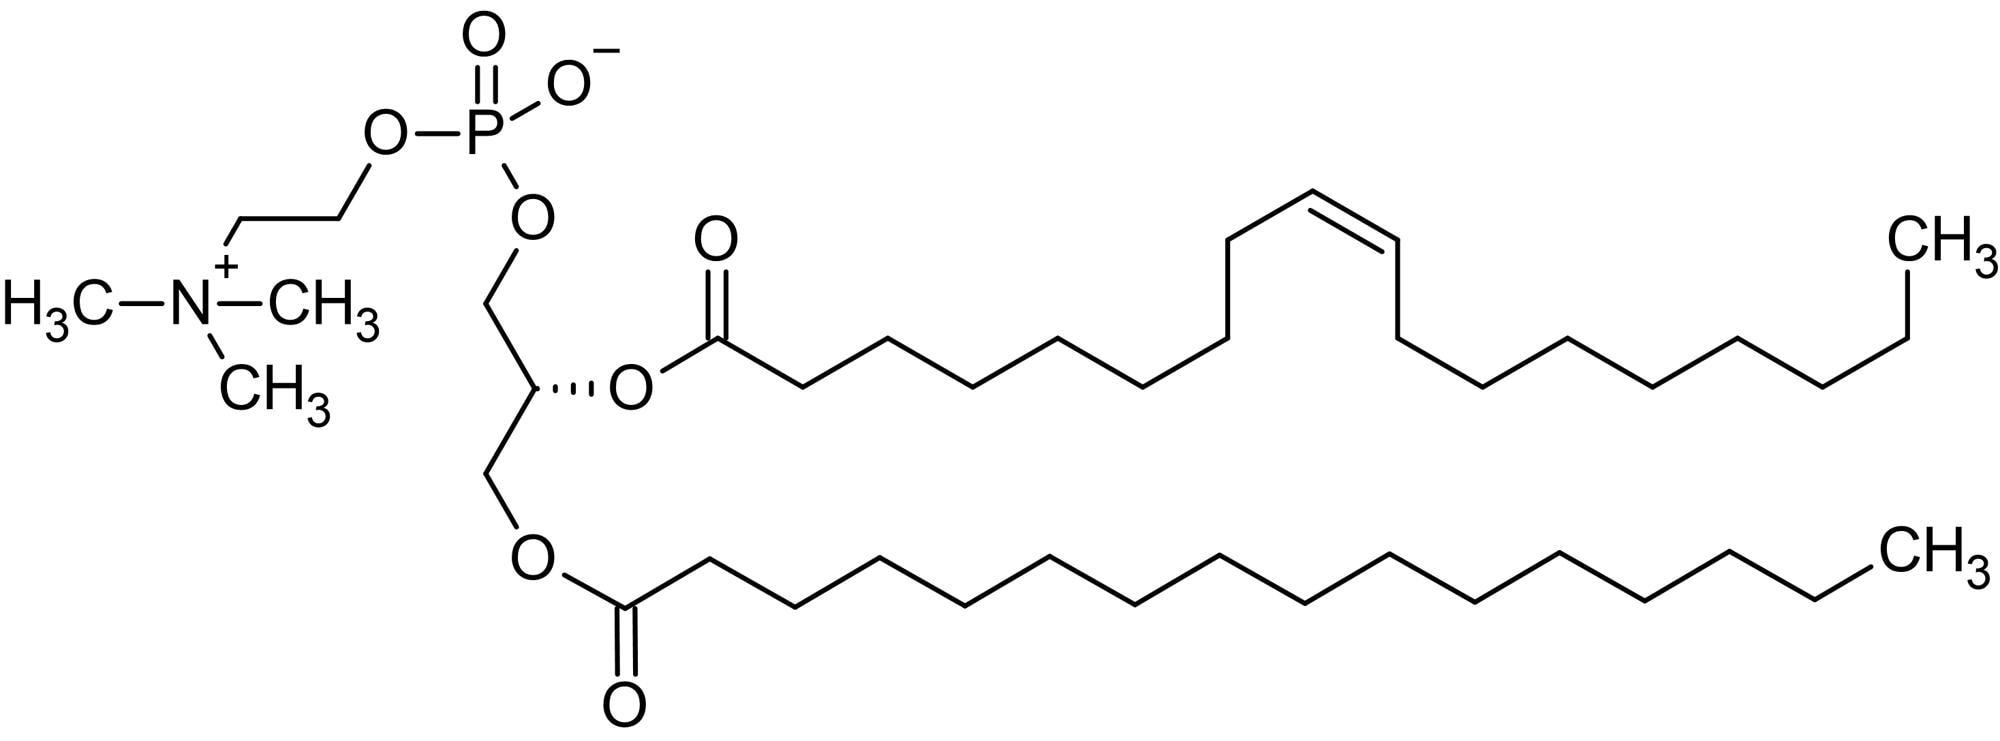 Chemical Structure - 1-Palmitoyl-2-oleoyl-sn-glycero-3-phosphorylcholine (POPC), Zwitterionic phospholipid (ab143958)